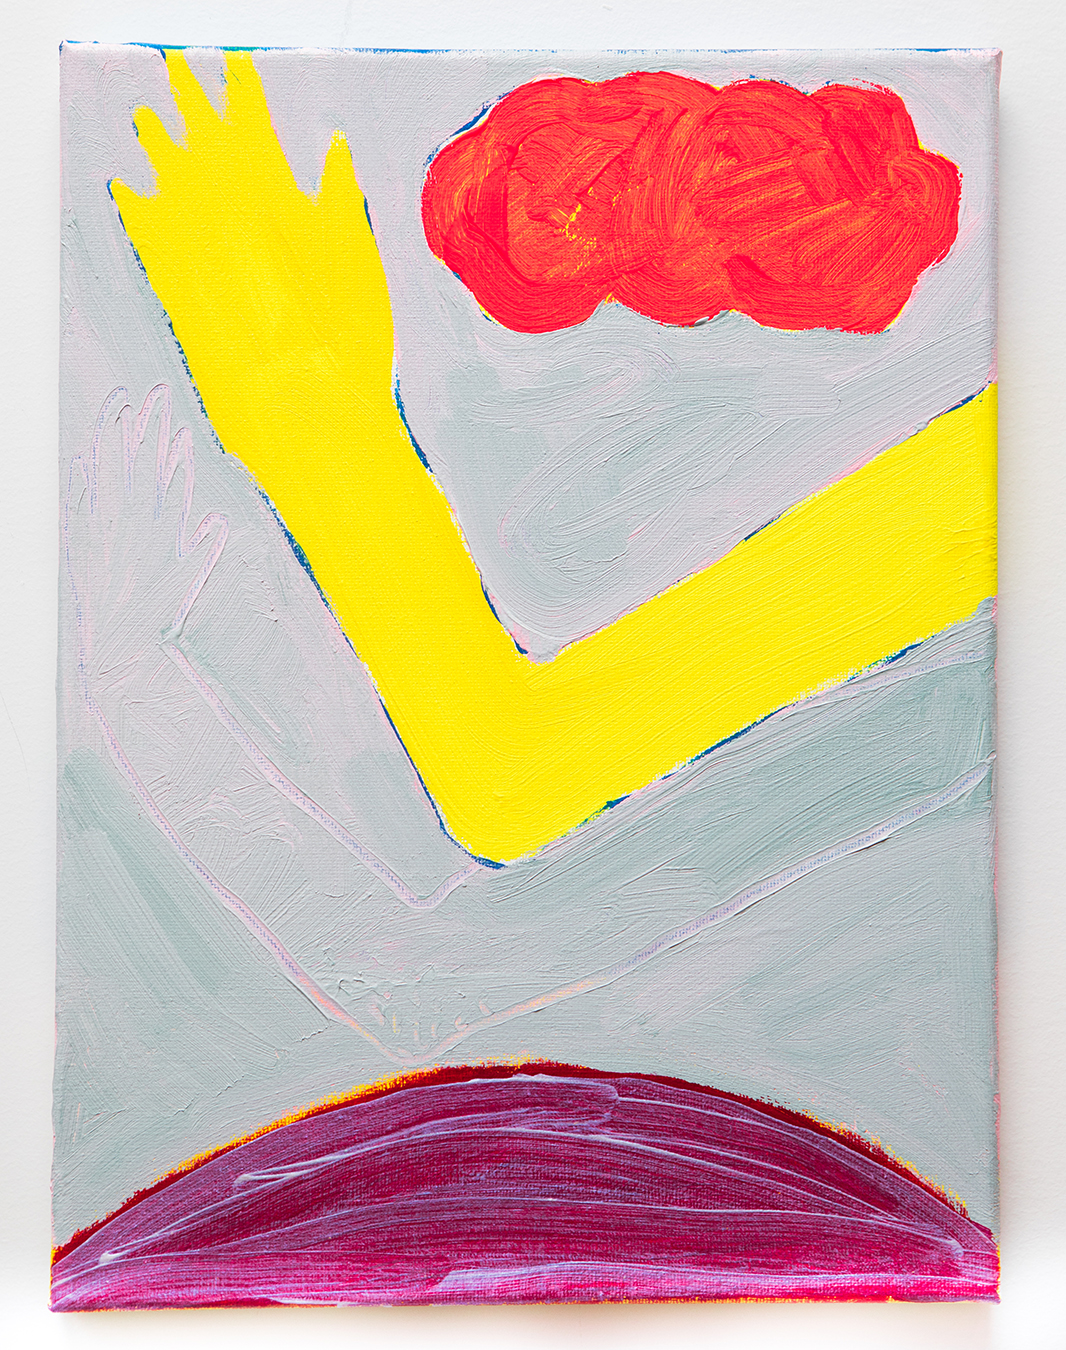 Yellow Arm, 2017